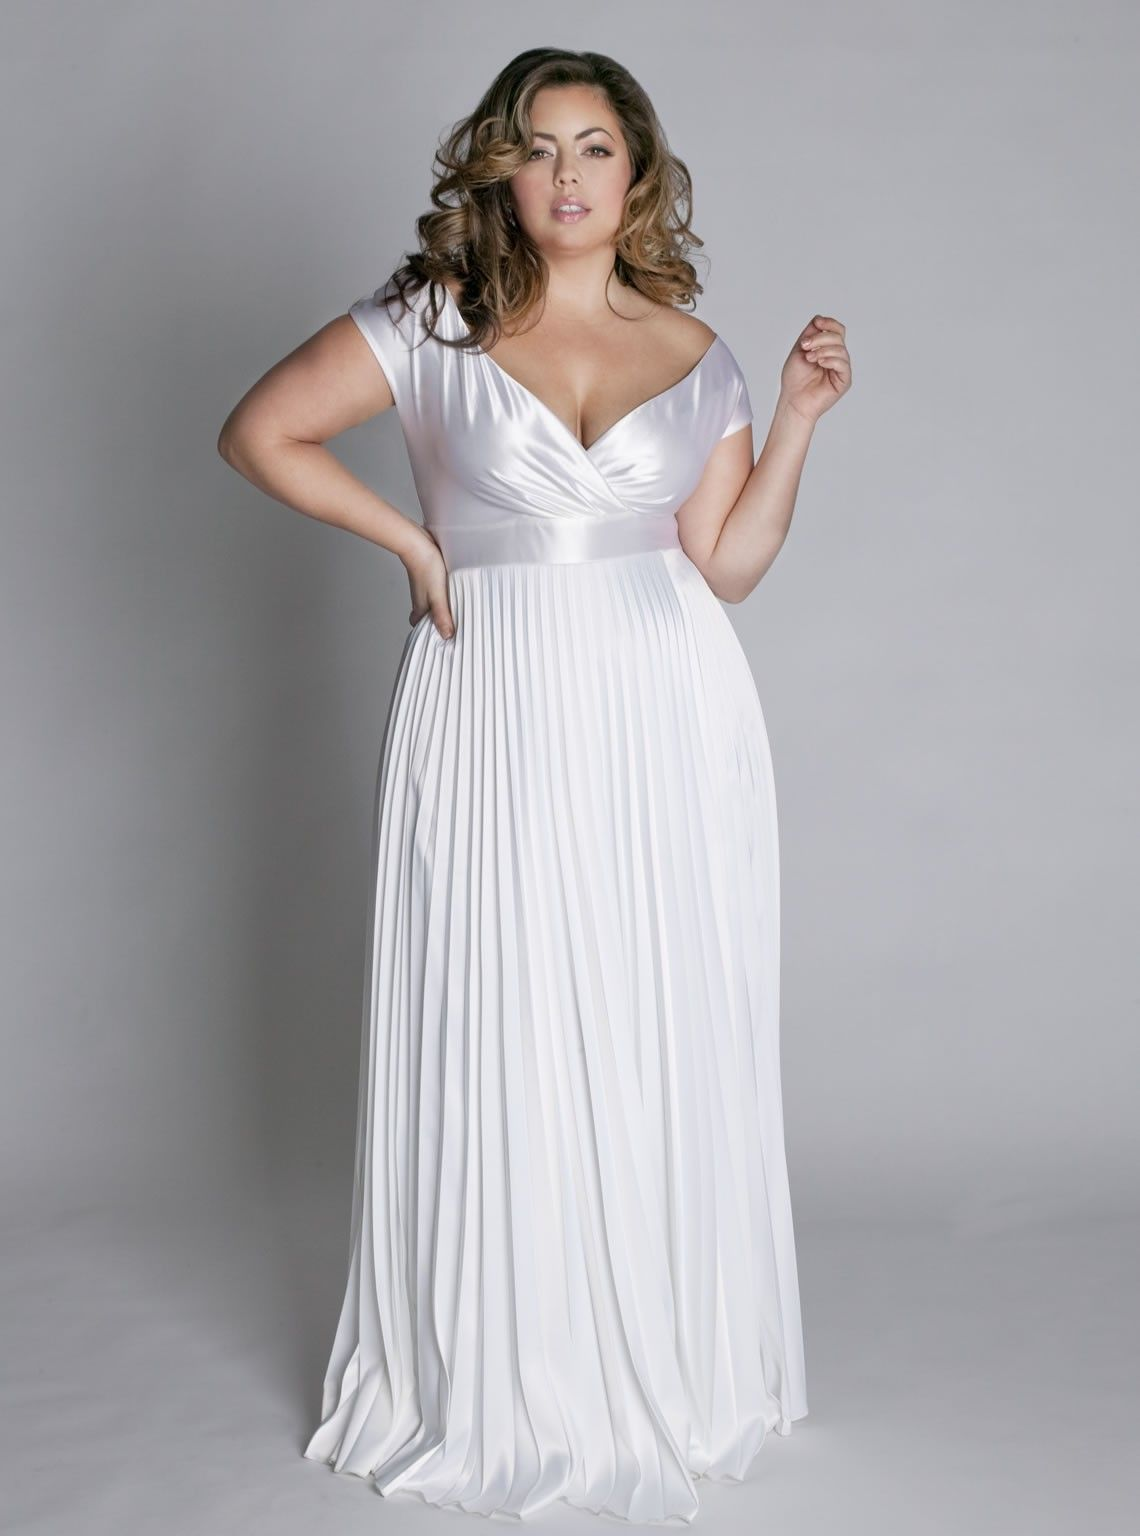 Second marriage wedding dresses plus size  Curvy Bride  Trajes novia talla grande  Pinterest  Girl blog